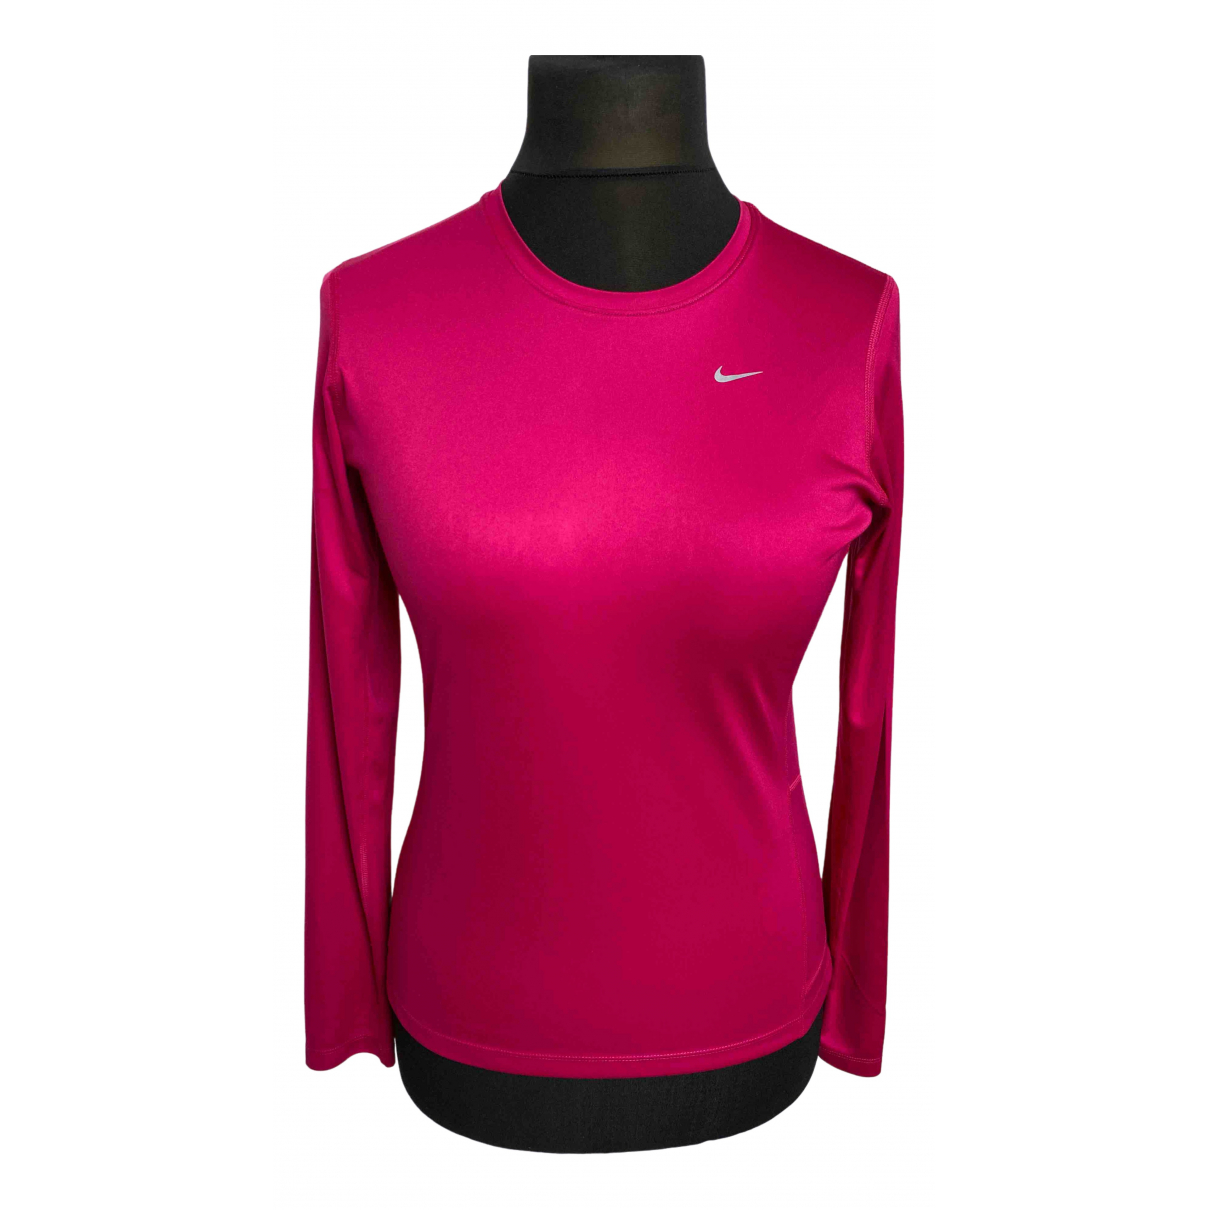 Nike - Top   pour femme - rose